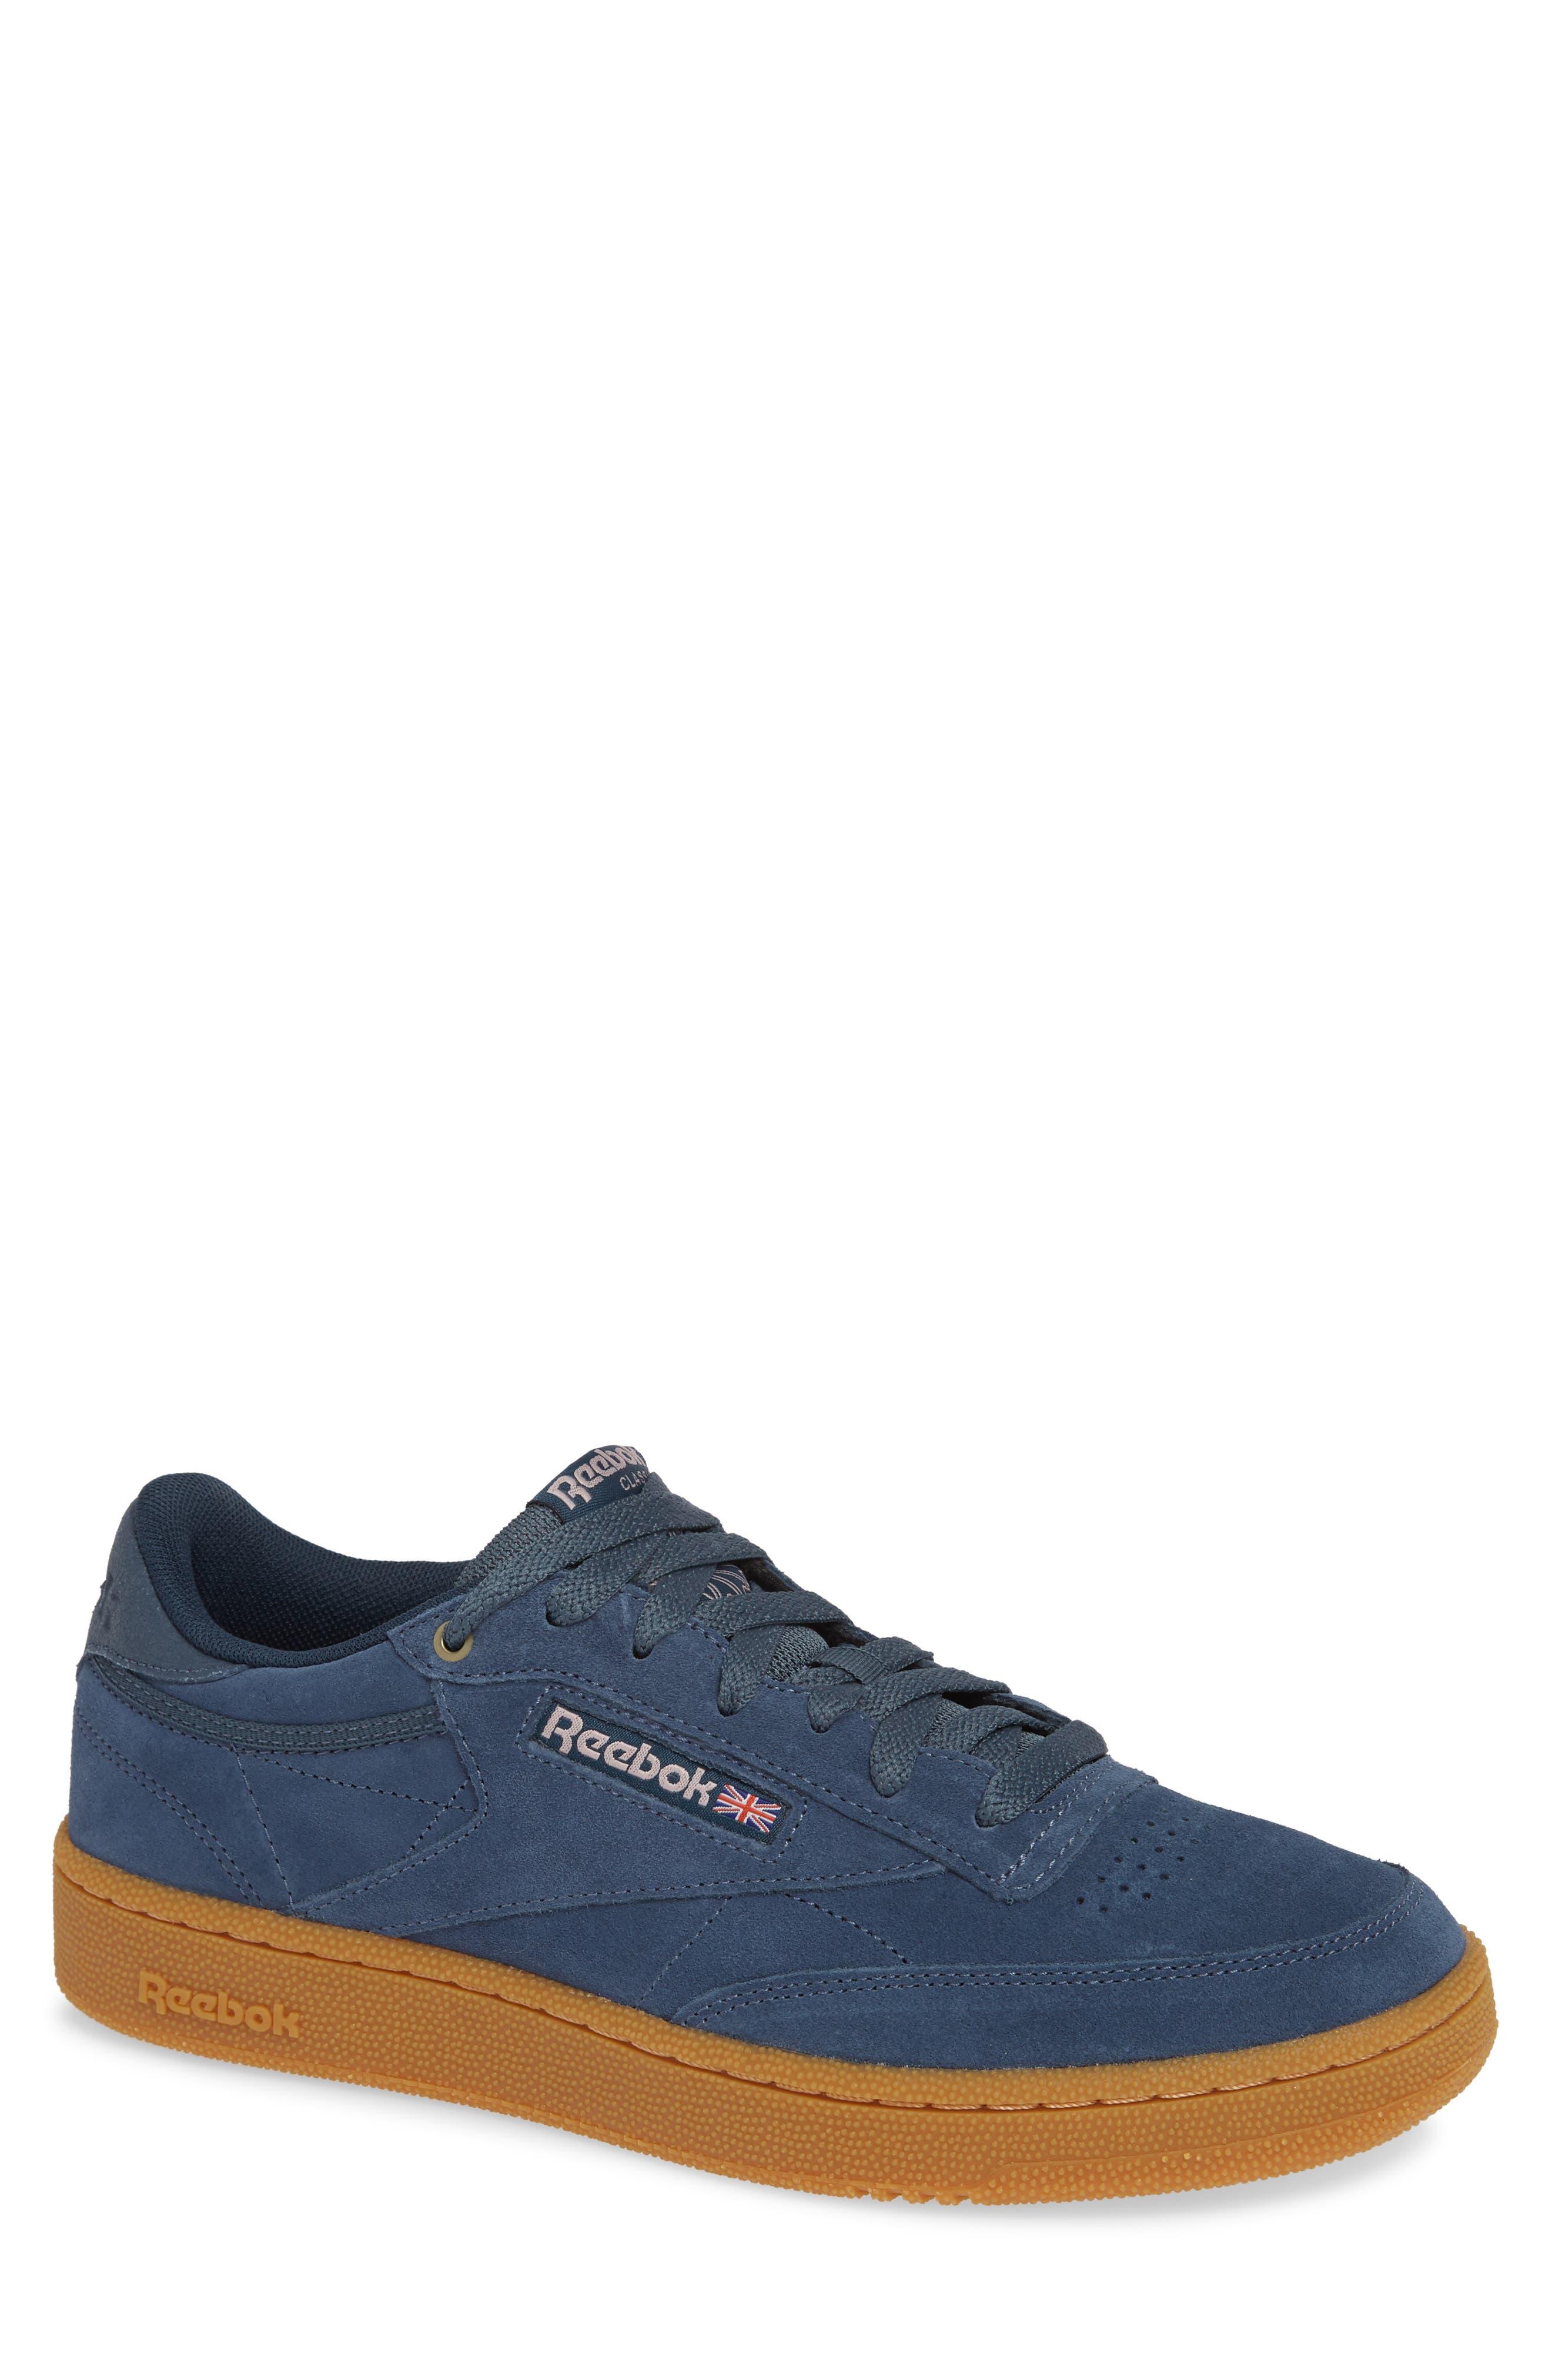 Club C 85 MU Sneaker,                             Main thumbnail 1, color,                             400